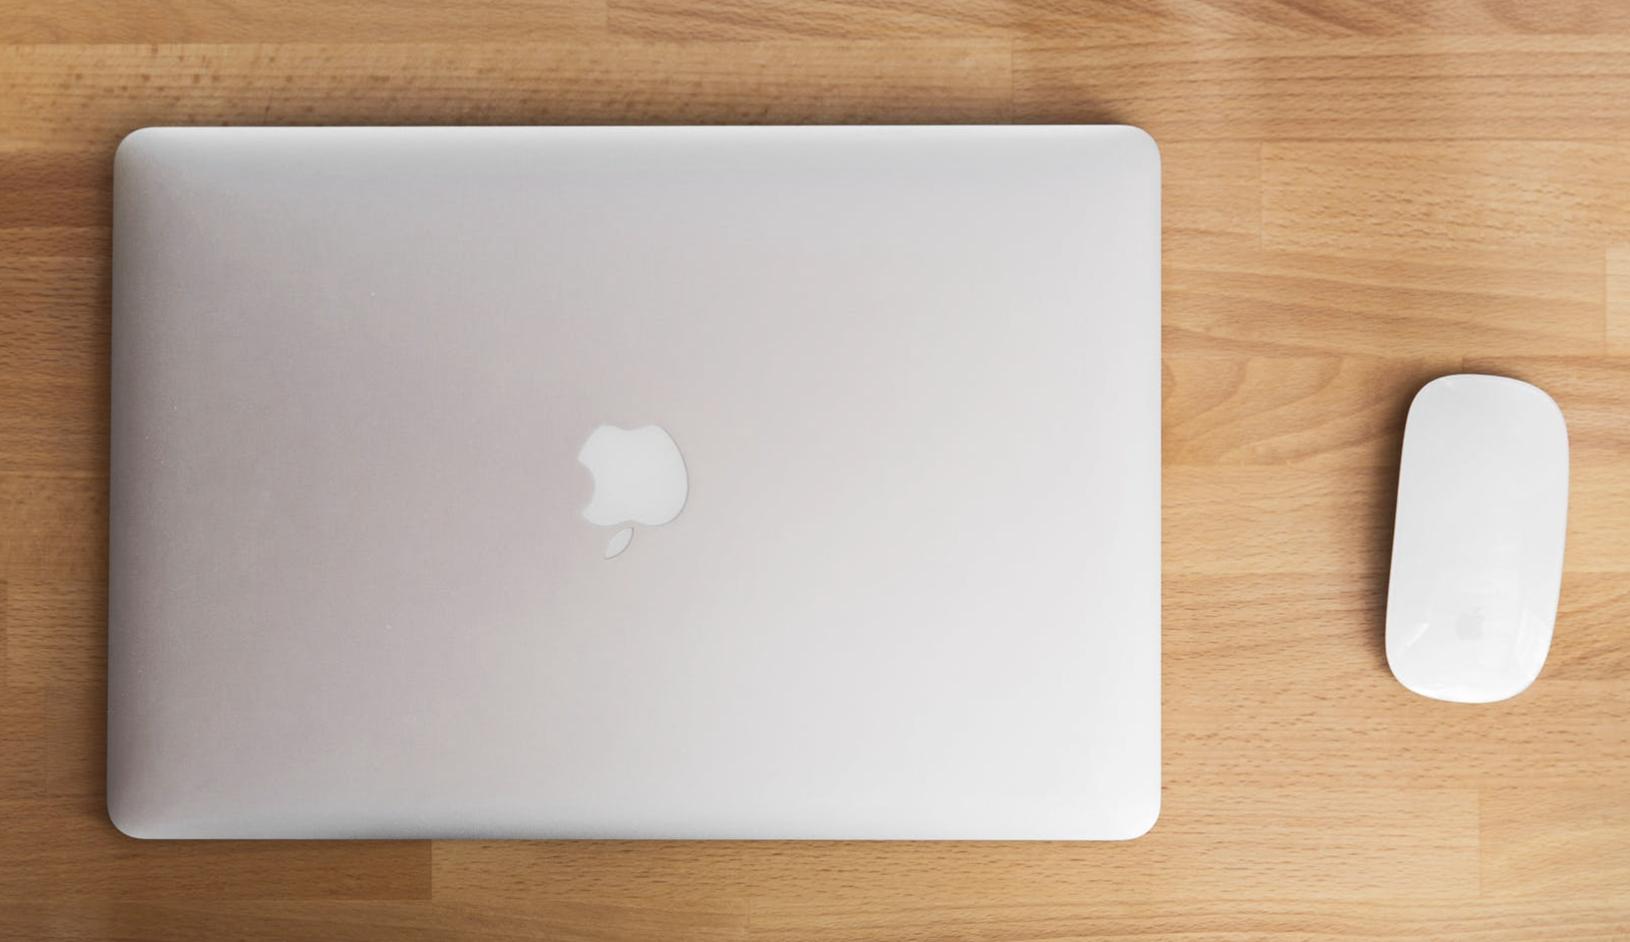 Macの知識:スクリーンショットとは?撮影プレビュー無効化(Mac OS Mojave)